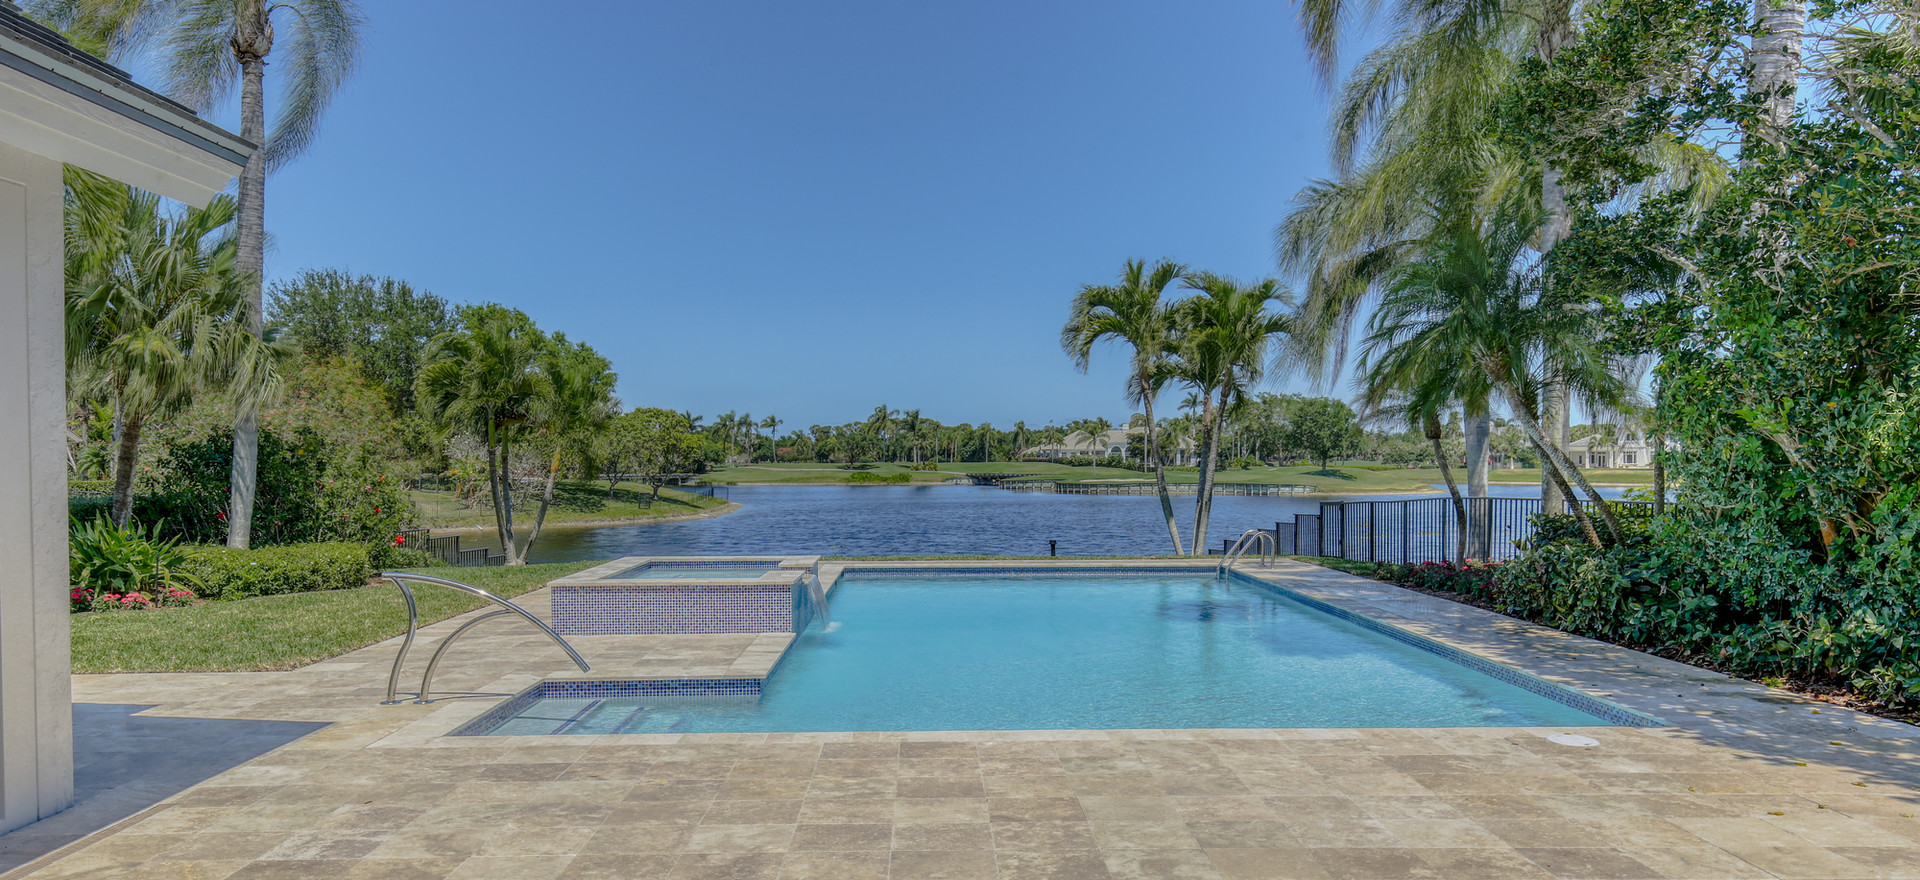 Real Estate Photography in the Cocoa, Cocoa beach, Melbourne, Palm Bay, Vero Beach Areas